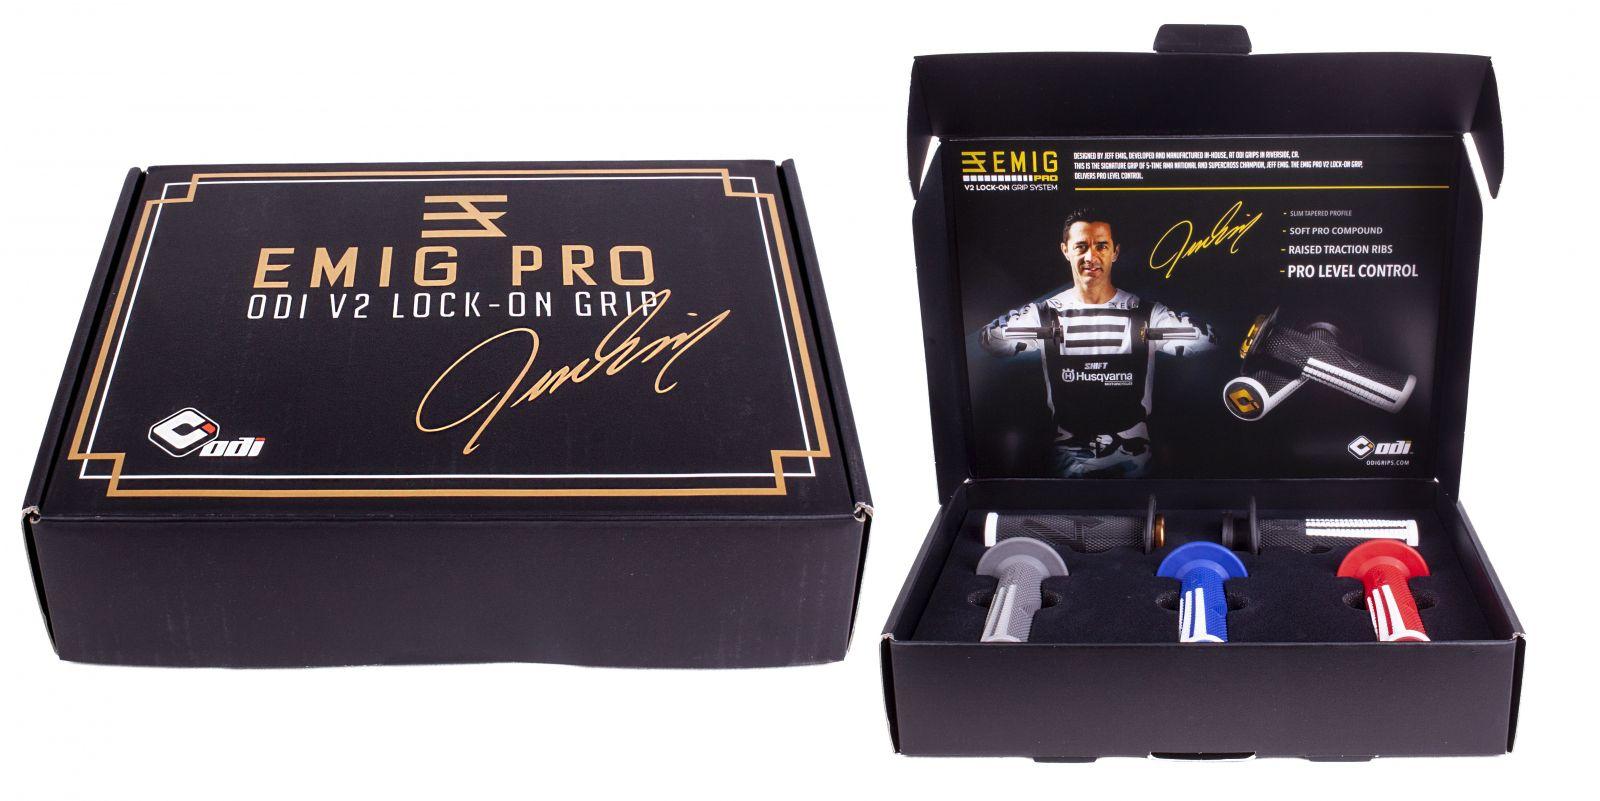 ODI GRIPS EMIG PRO Promo Kit - Special edition